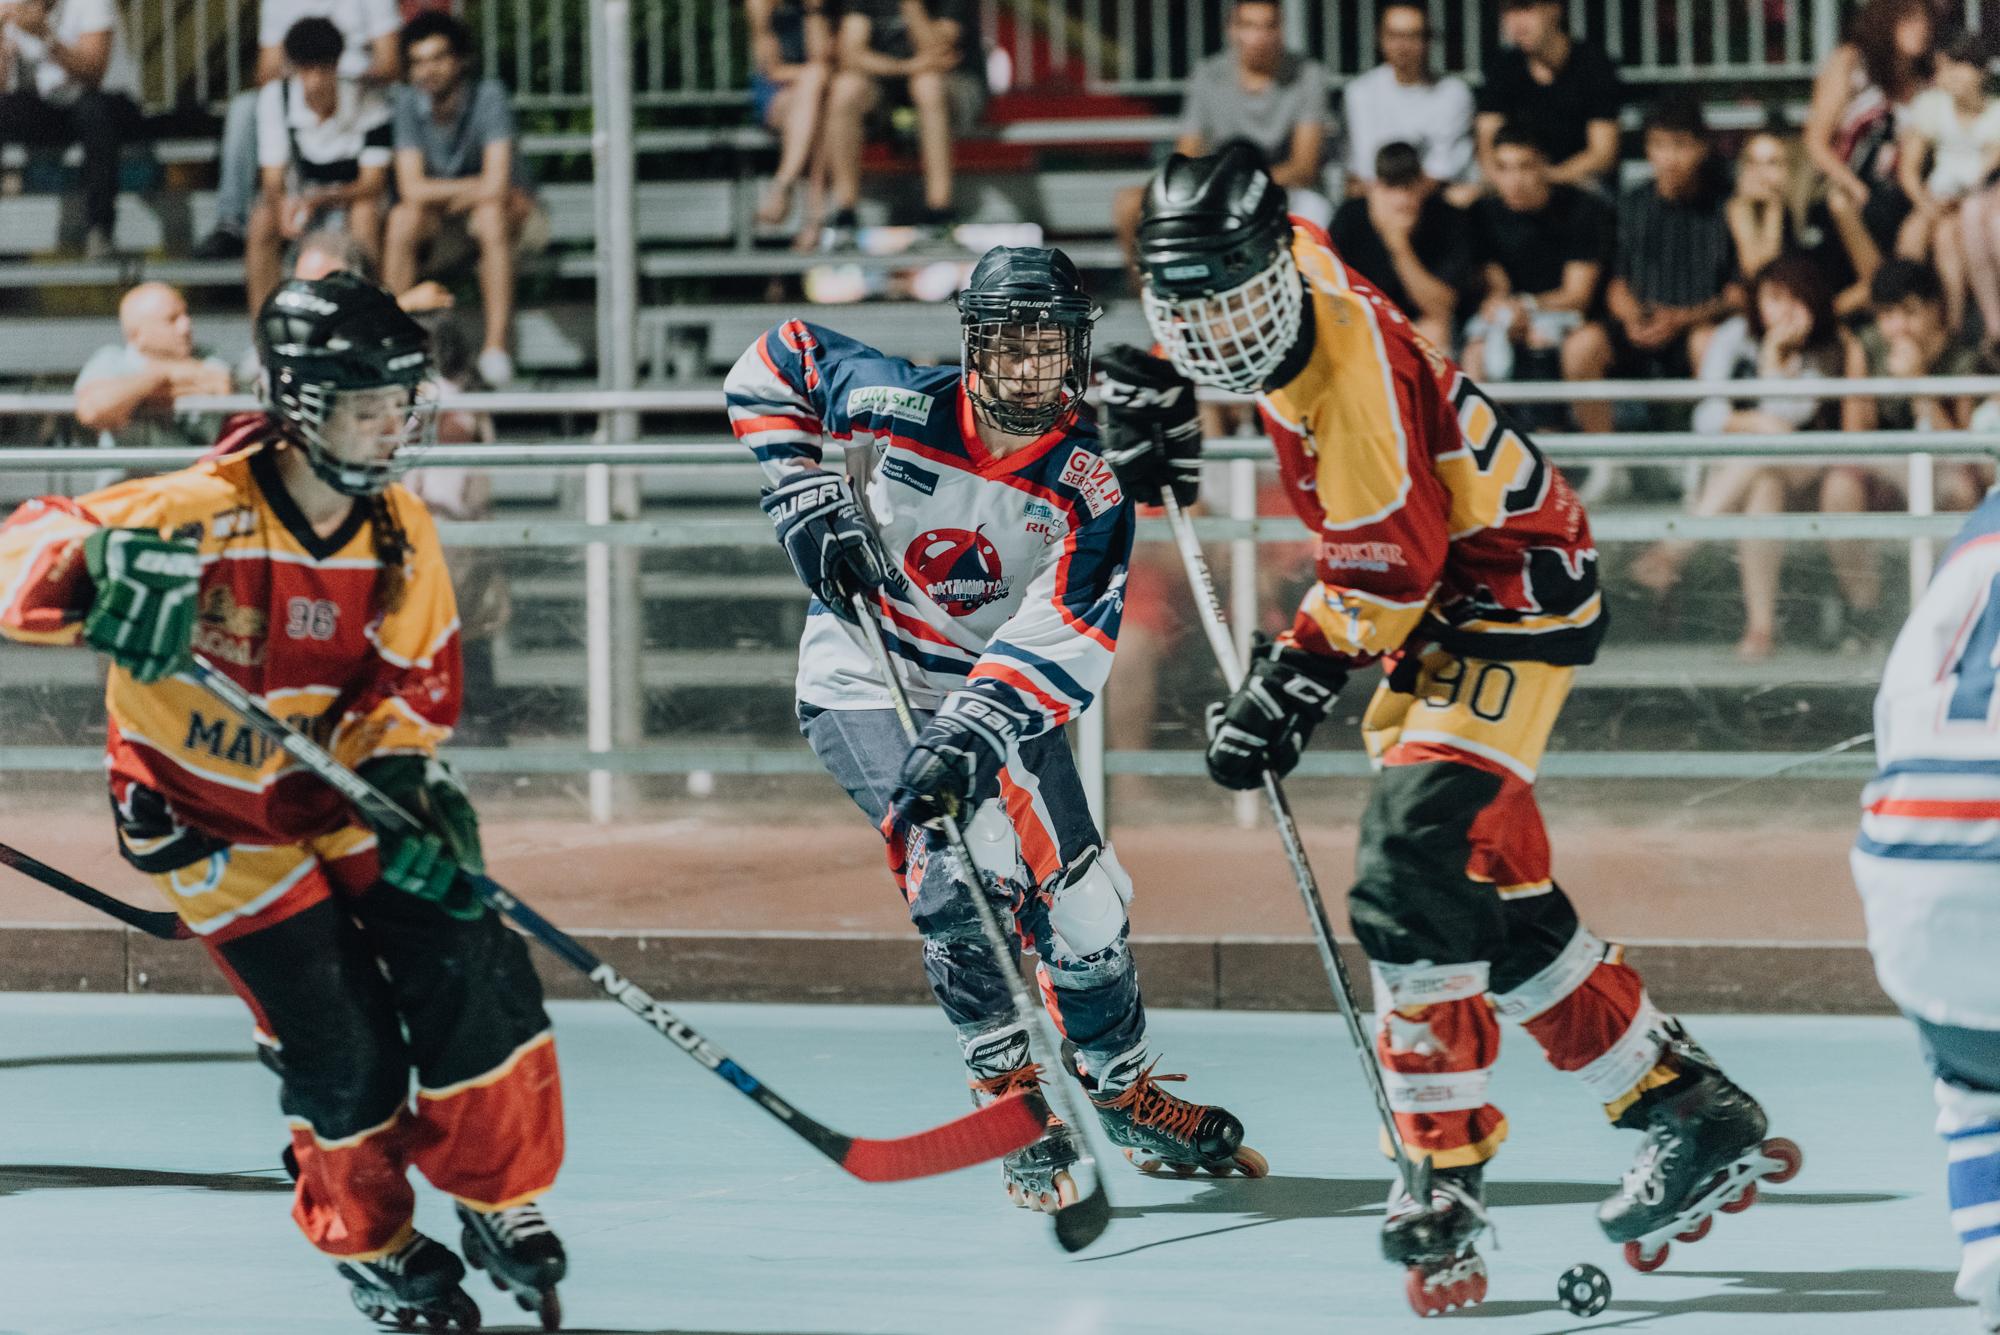 hockey inline, mammuth hockey, mammuth roma, inline hockey, inline hockey roma, roller hockey, Giacio Forever, San Benedetto, Rita foldi photography, sports photography